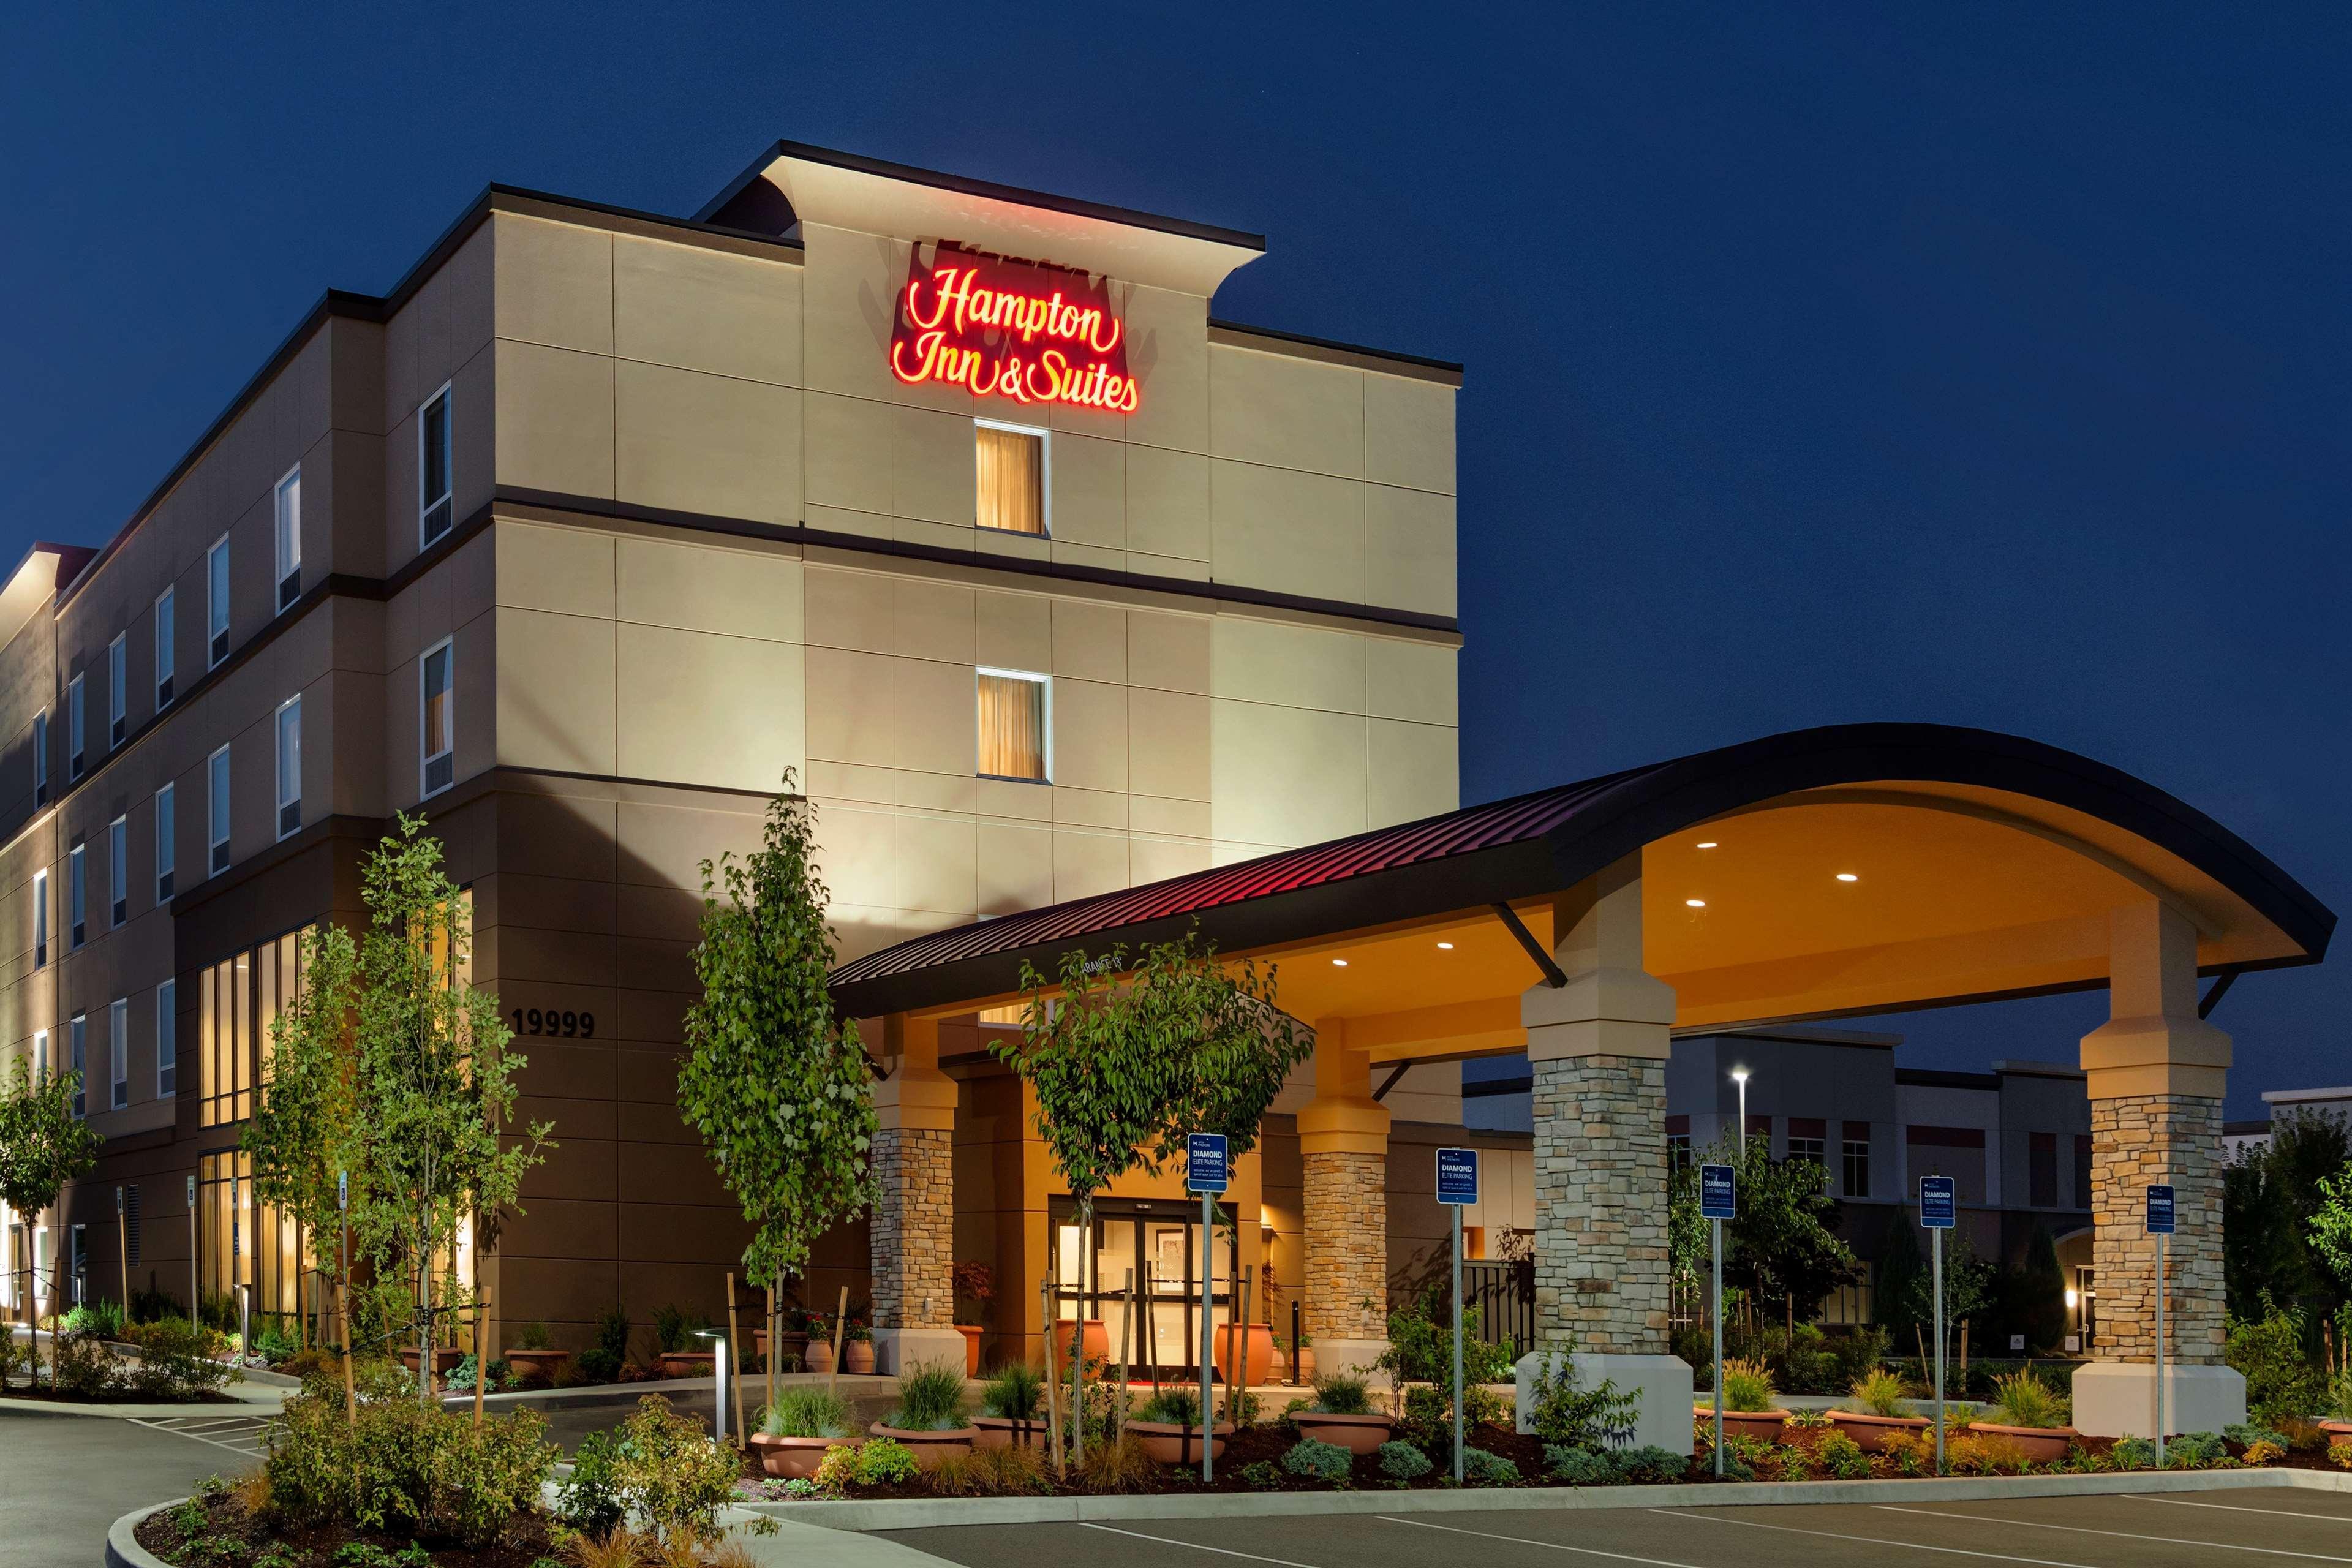 Hampton Inn and Suites Hillsboro, Washington